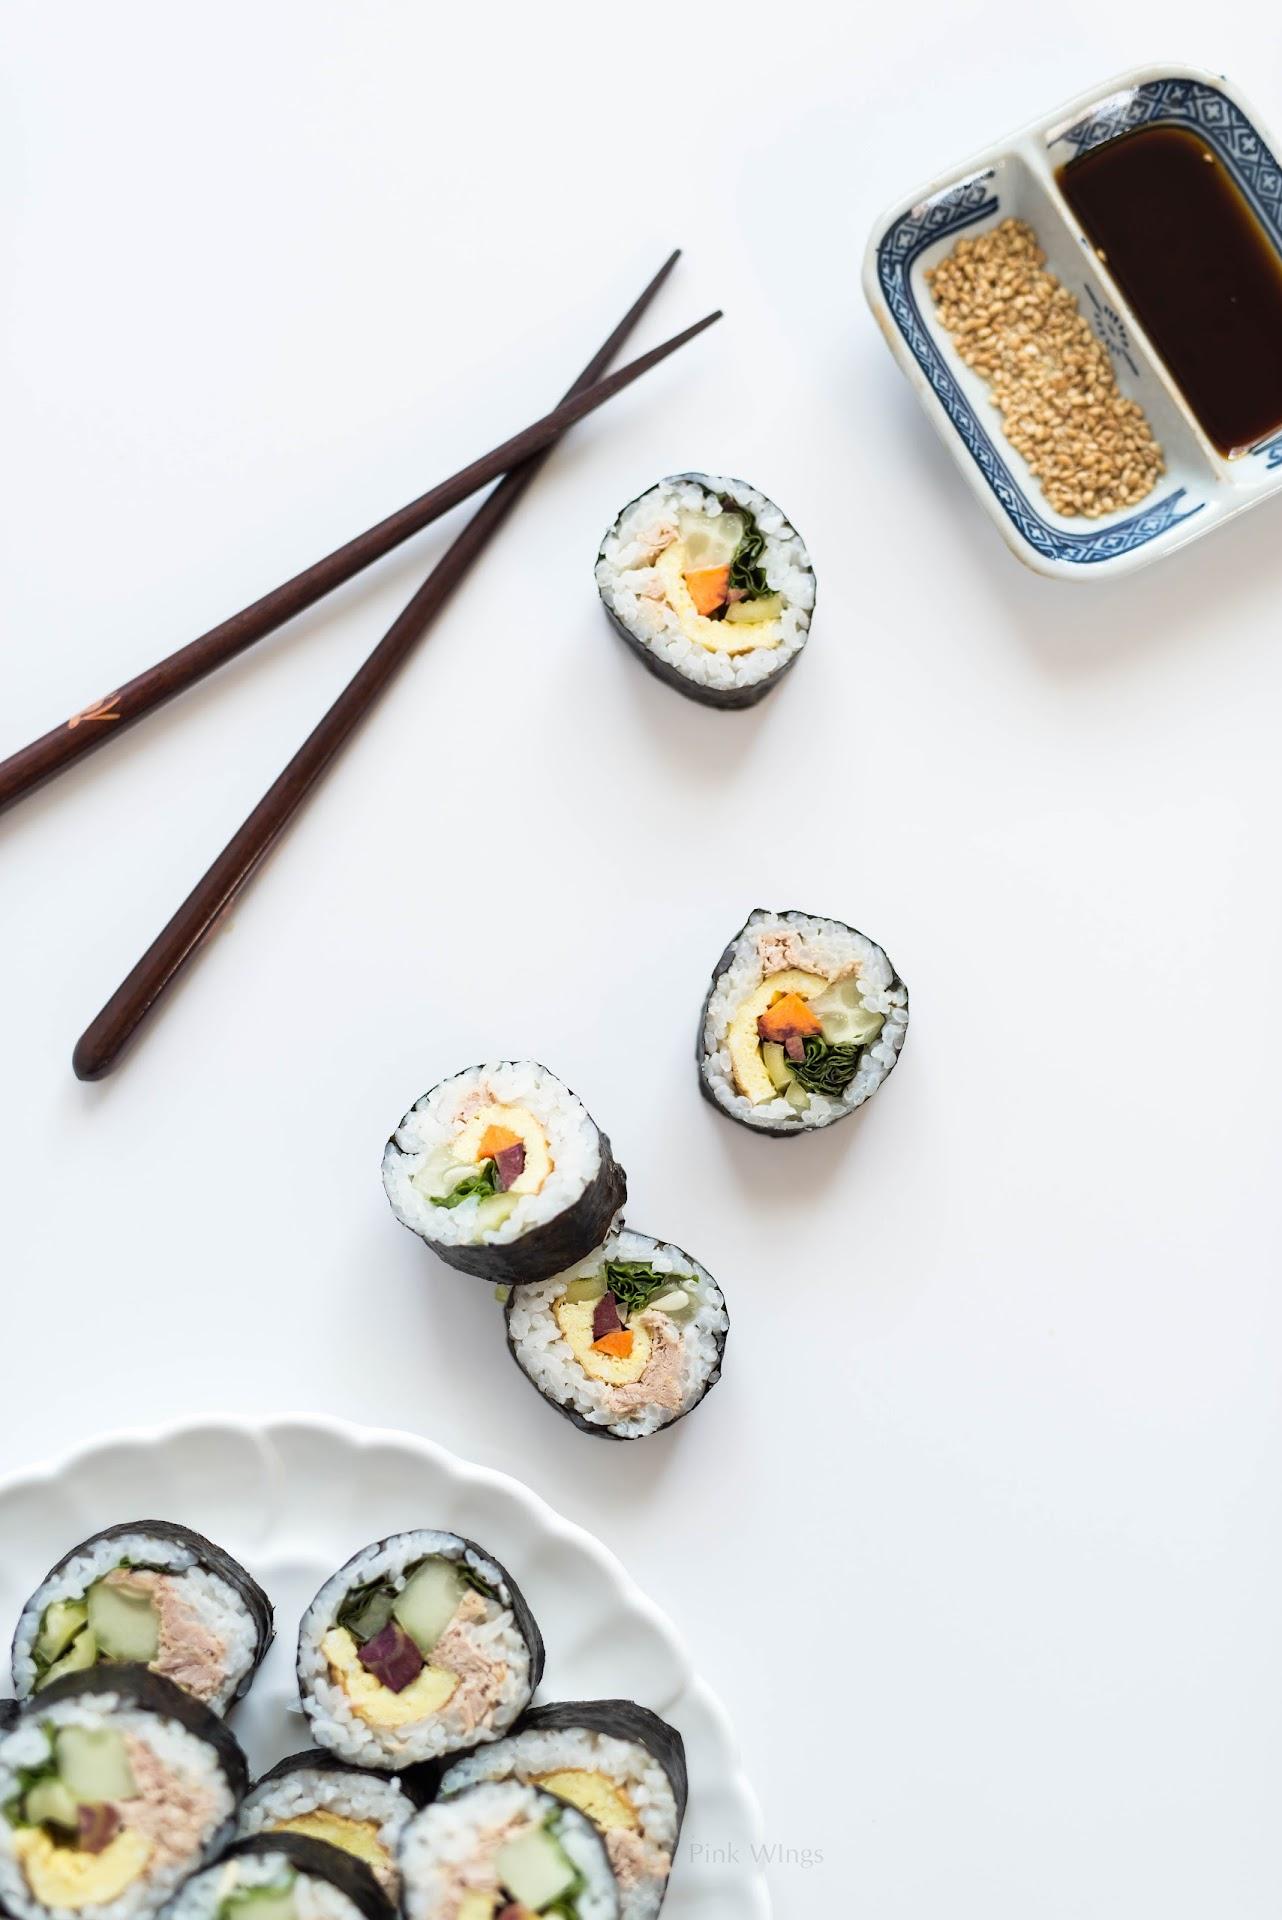 kimbap recipe, korean food blog, korean blogger, lds, mormon, asian, asian food, sushi, healthy snack, nutritious, farm fresh to you review